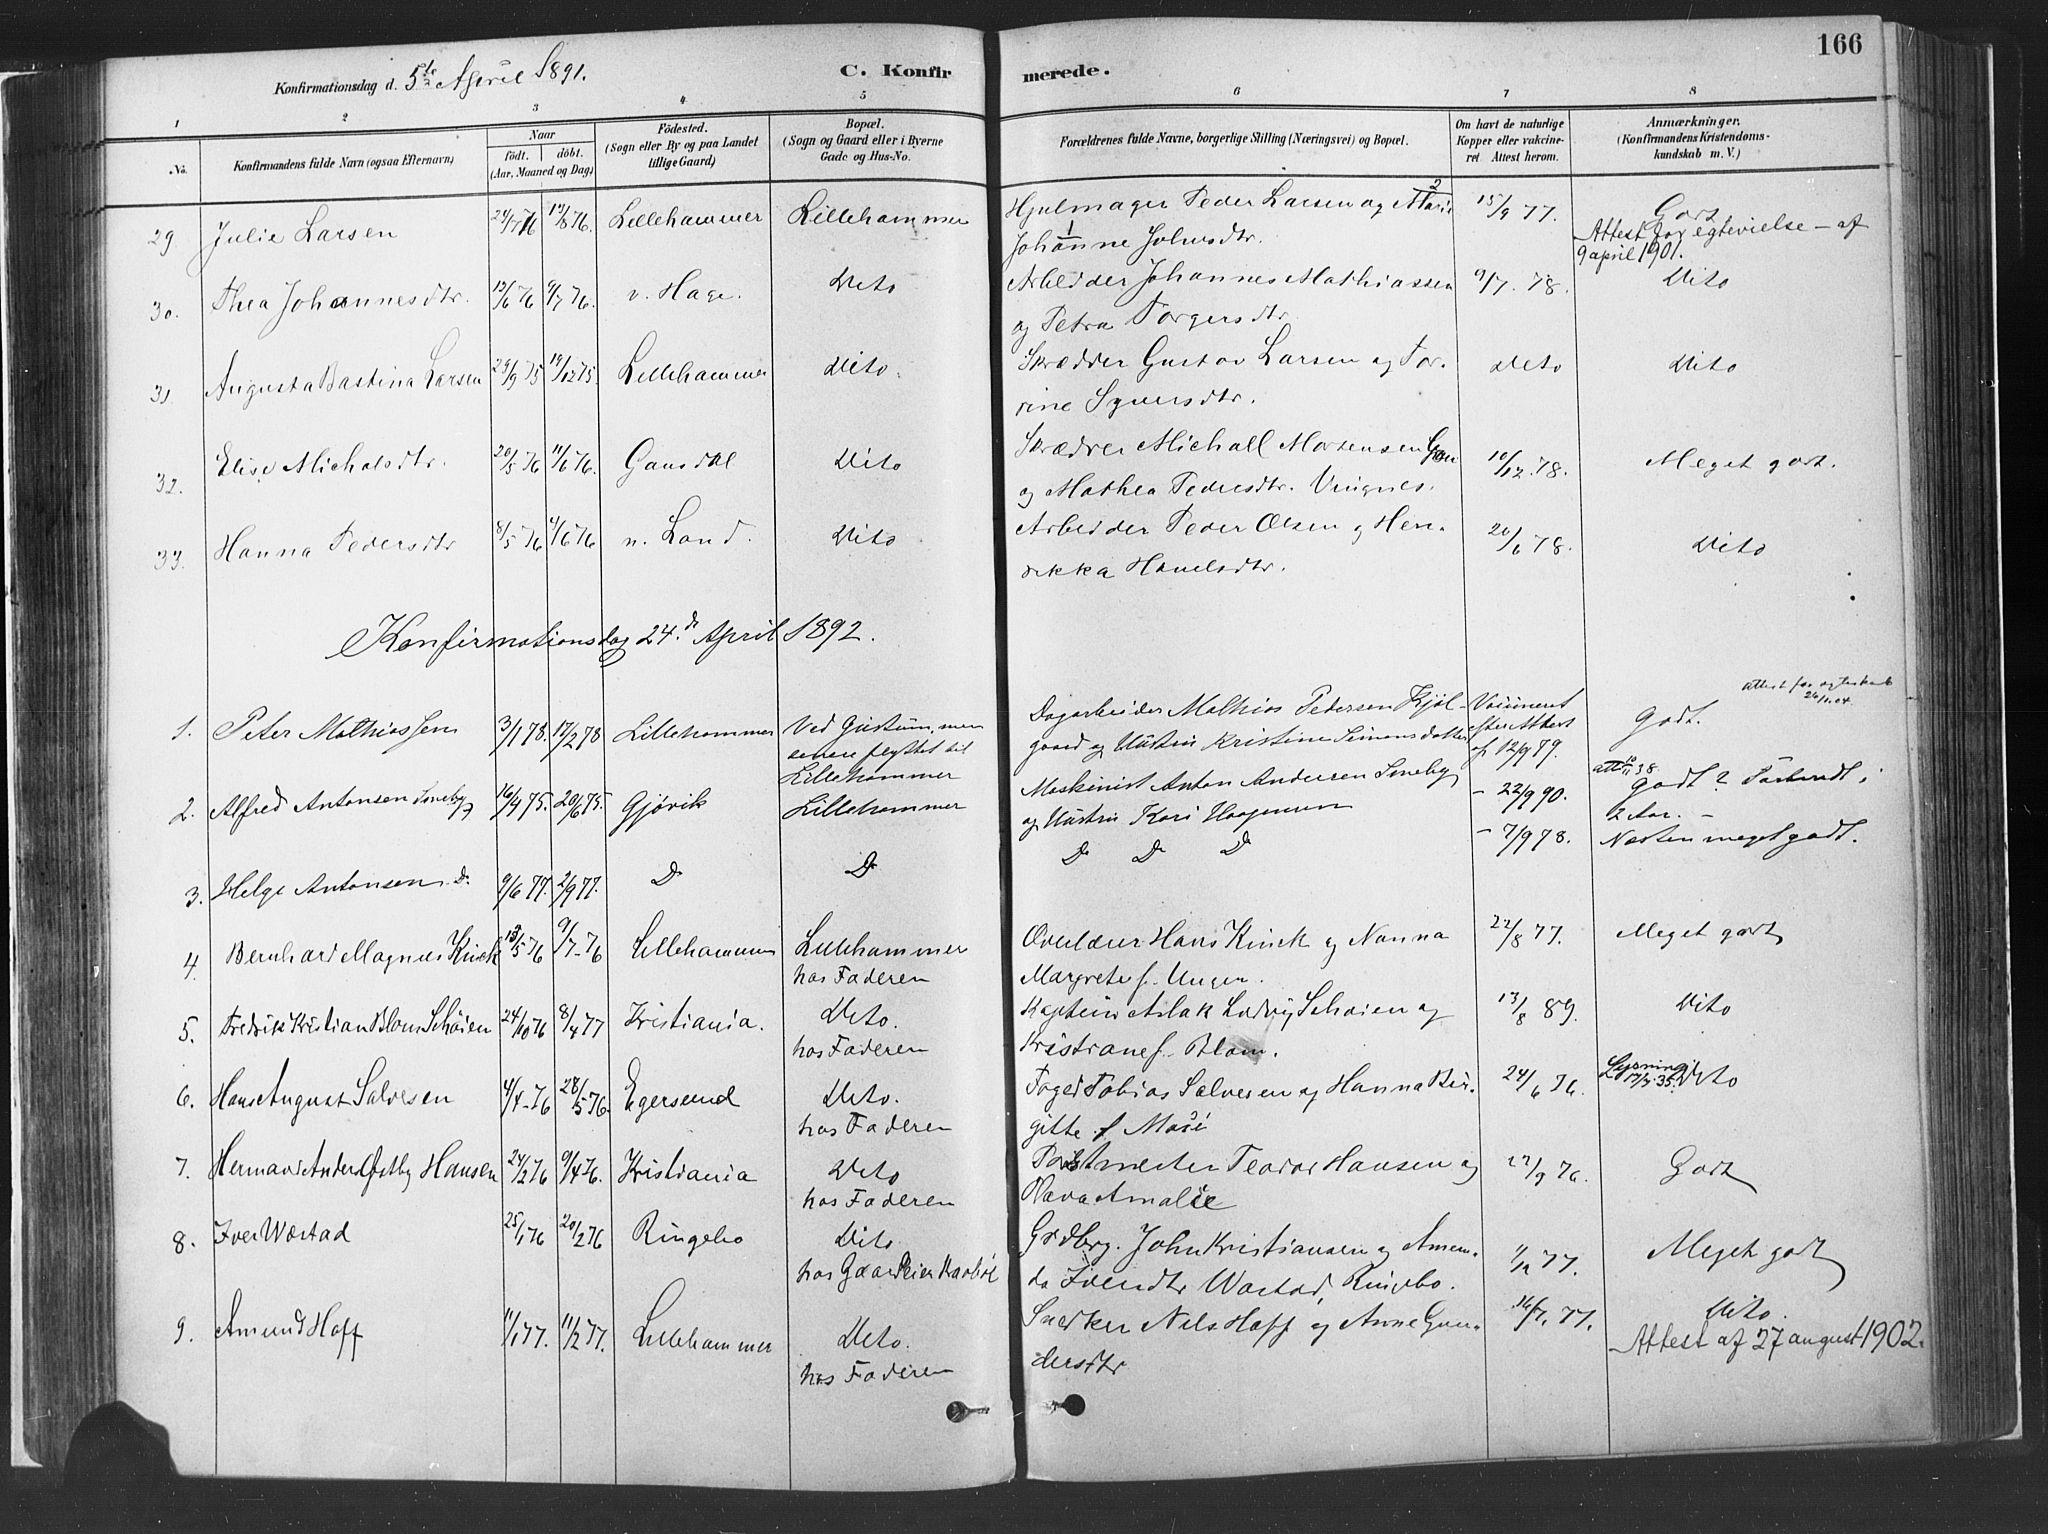 SAH, Fåberg prestekontor, H/Ha/Haa/L0010: Parish register (official) no. 10, 1879-1900, p. 166